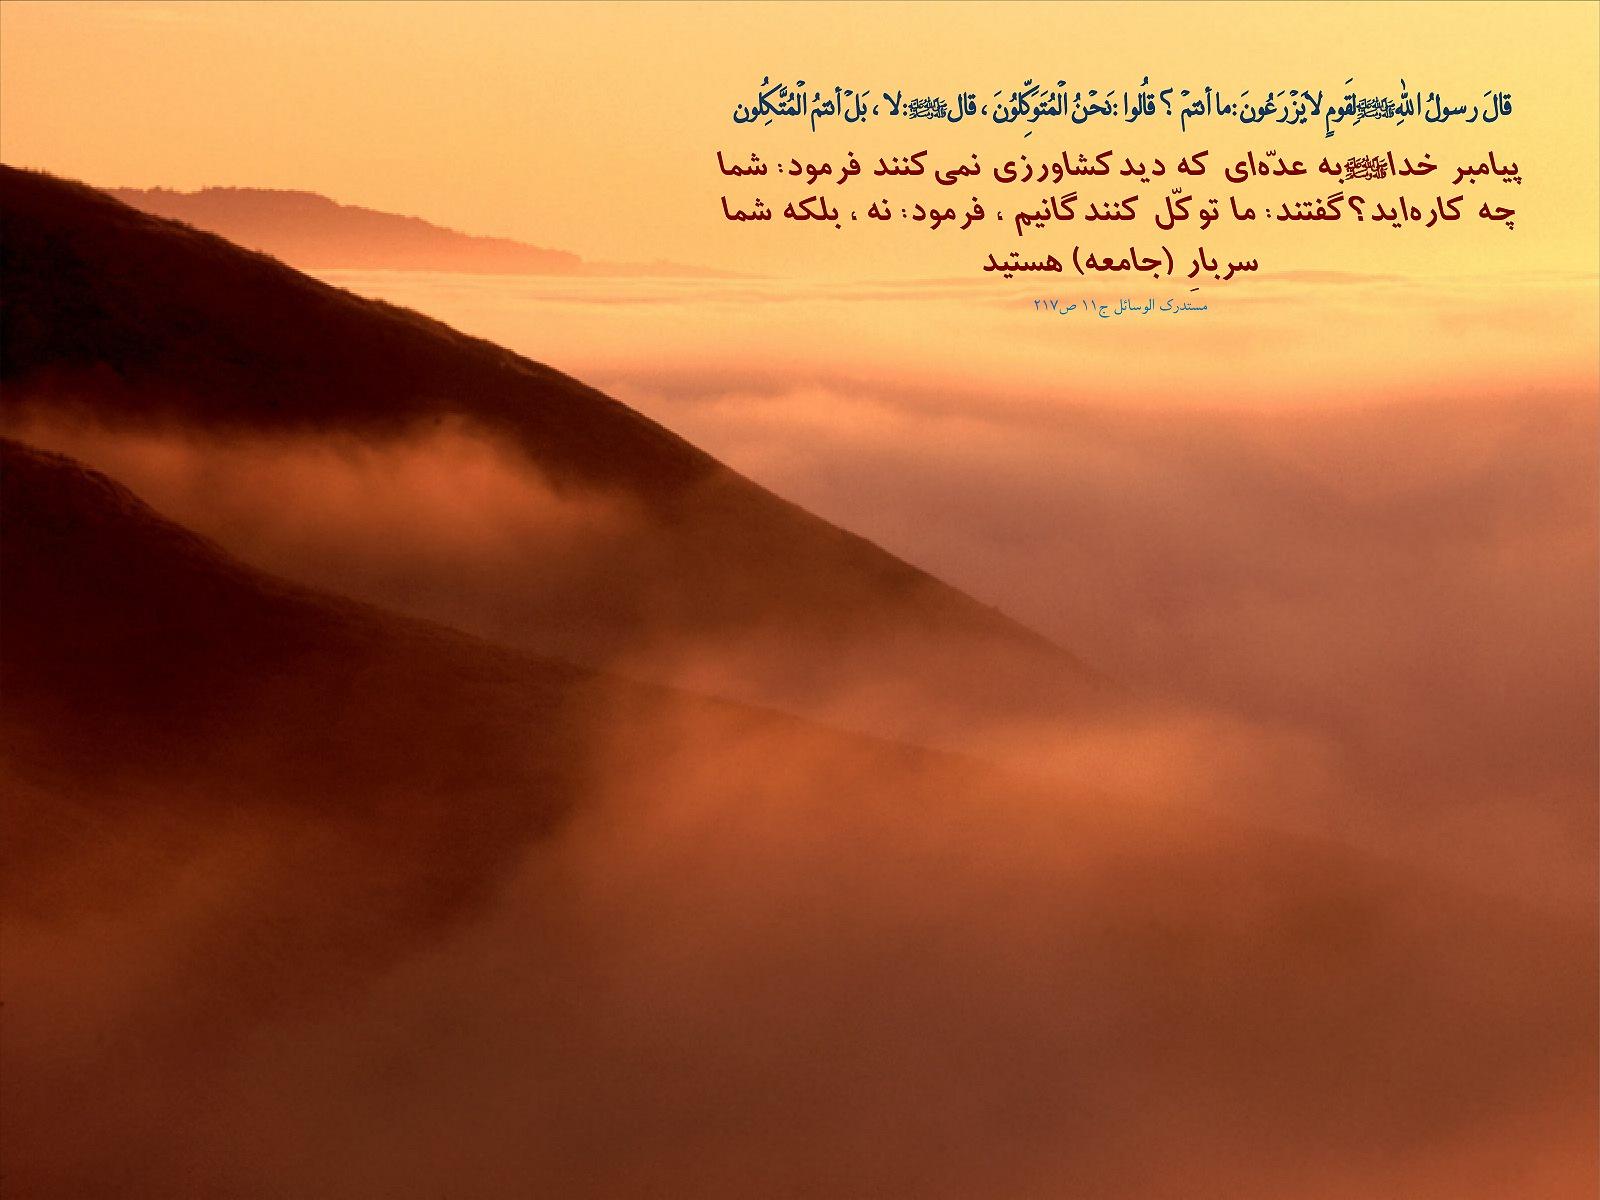 http://mhkh1972.gohardasht.com/uploaded/_8B5250DB-CF95-47CC-9EA5-6FE42EA9CB92_.jpg